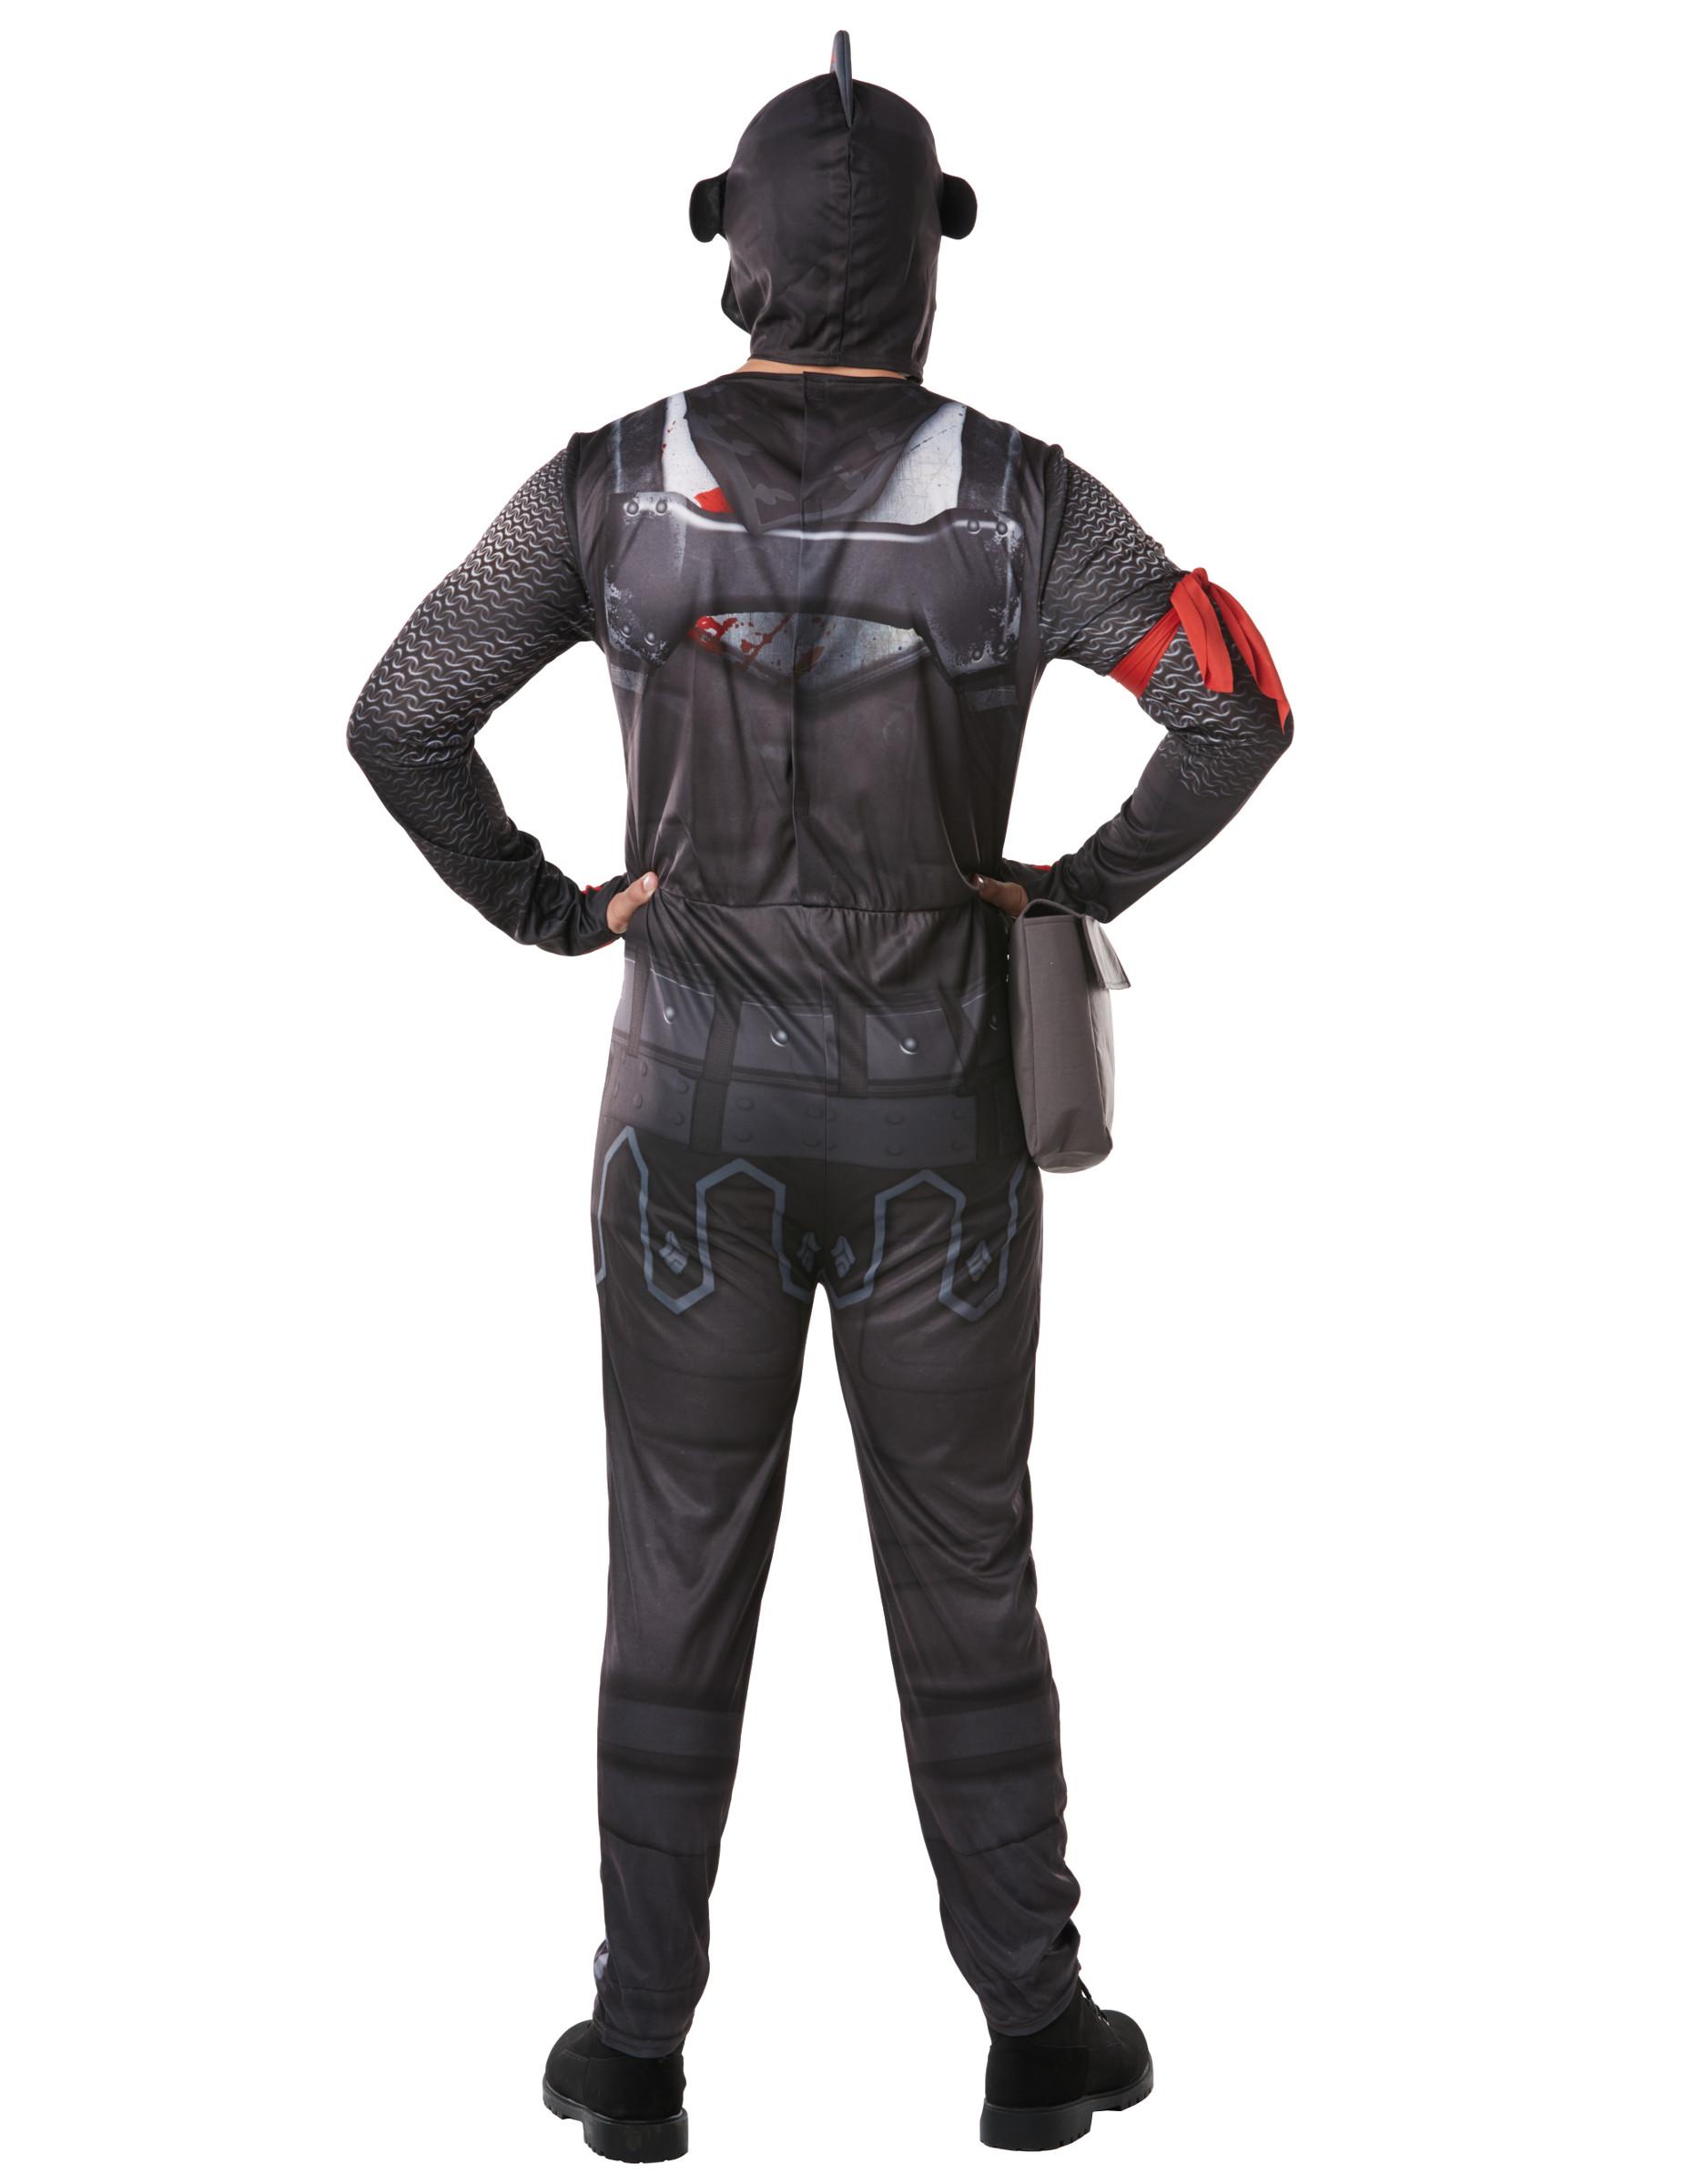 Déguisement Black Knight Fortnite™ adulte,1